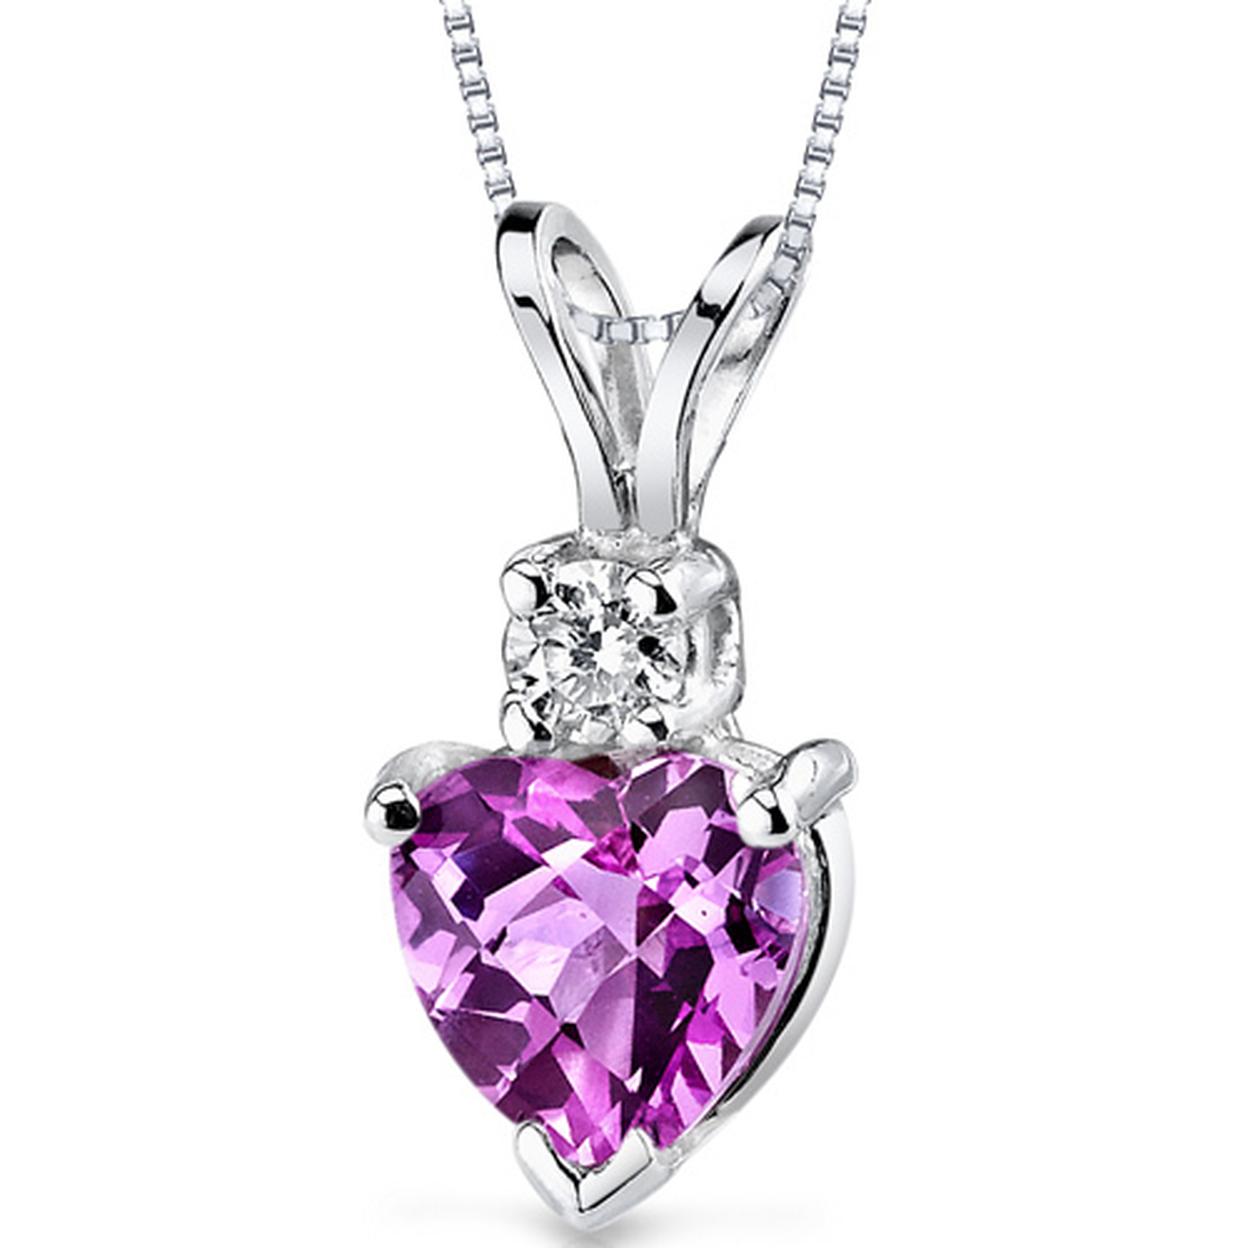 14 Karat White Gold Heart Shape 1.00 Carats Created Pink Sapphire Diamond Pendant